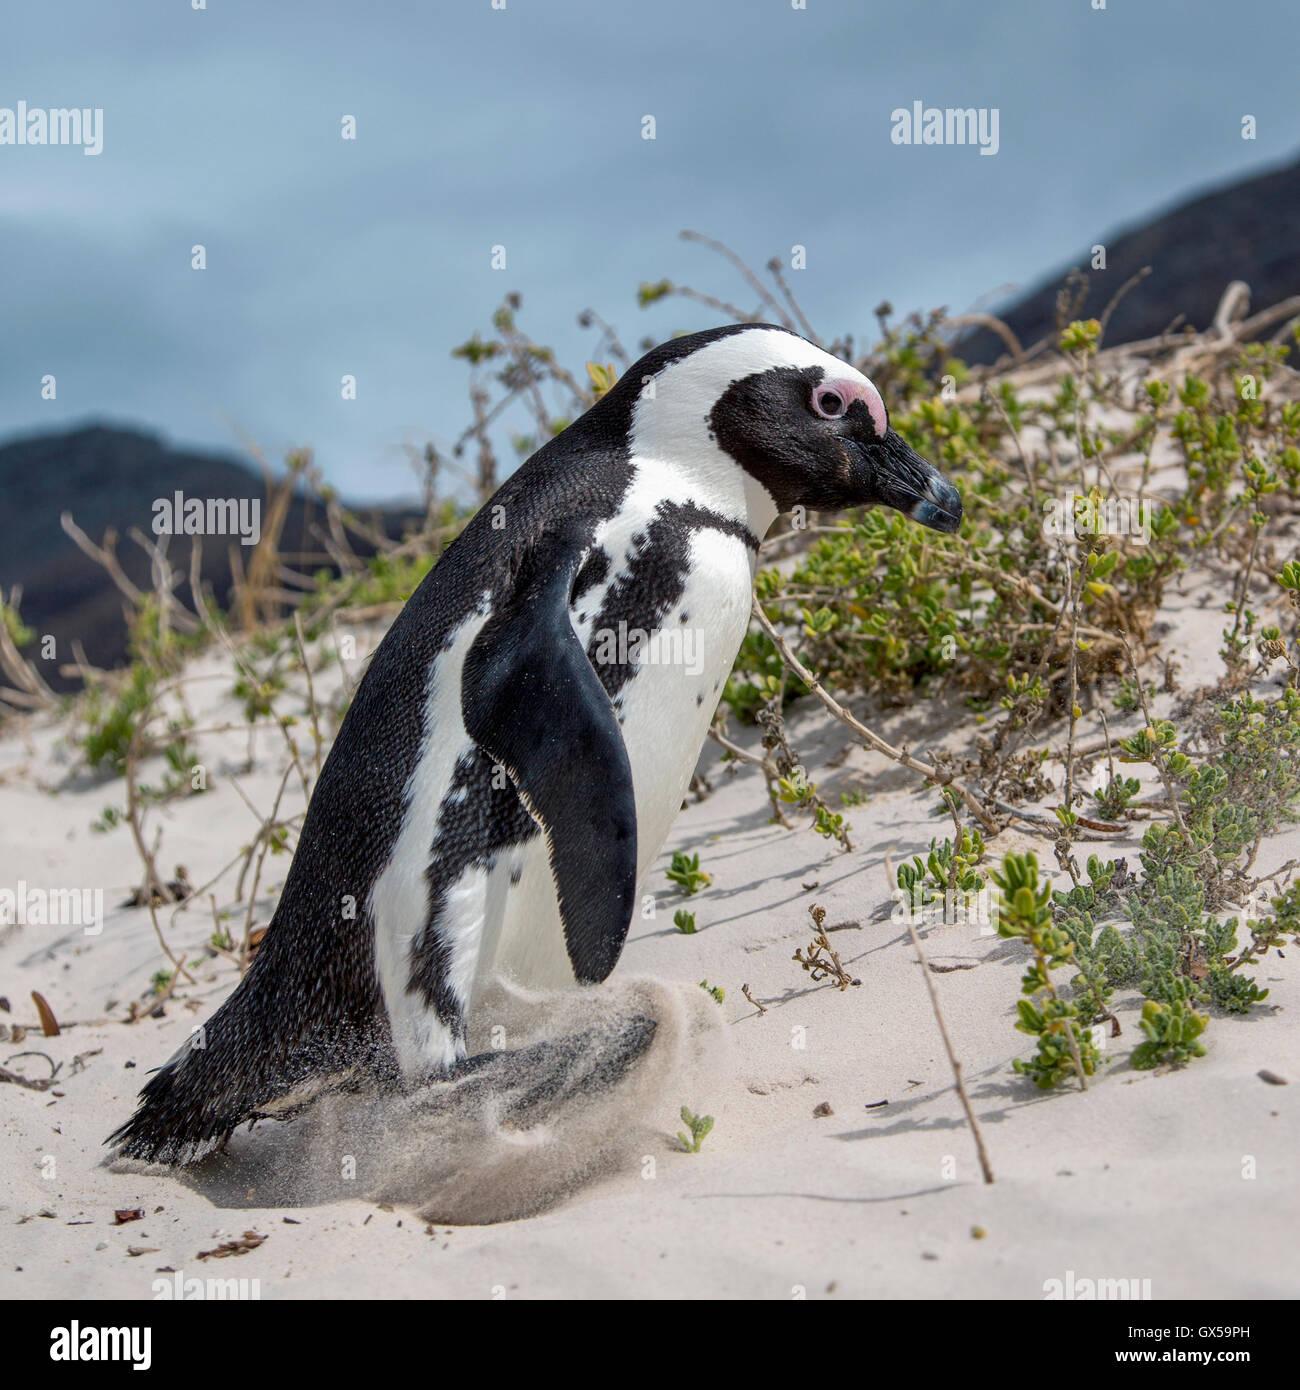 An African Penguin walking along the beach at Boulder Beach, South Africa - Stock Image